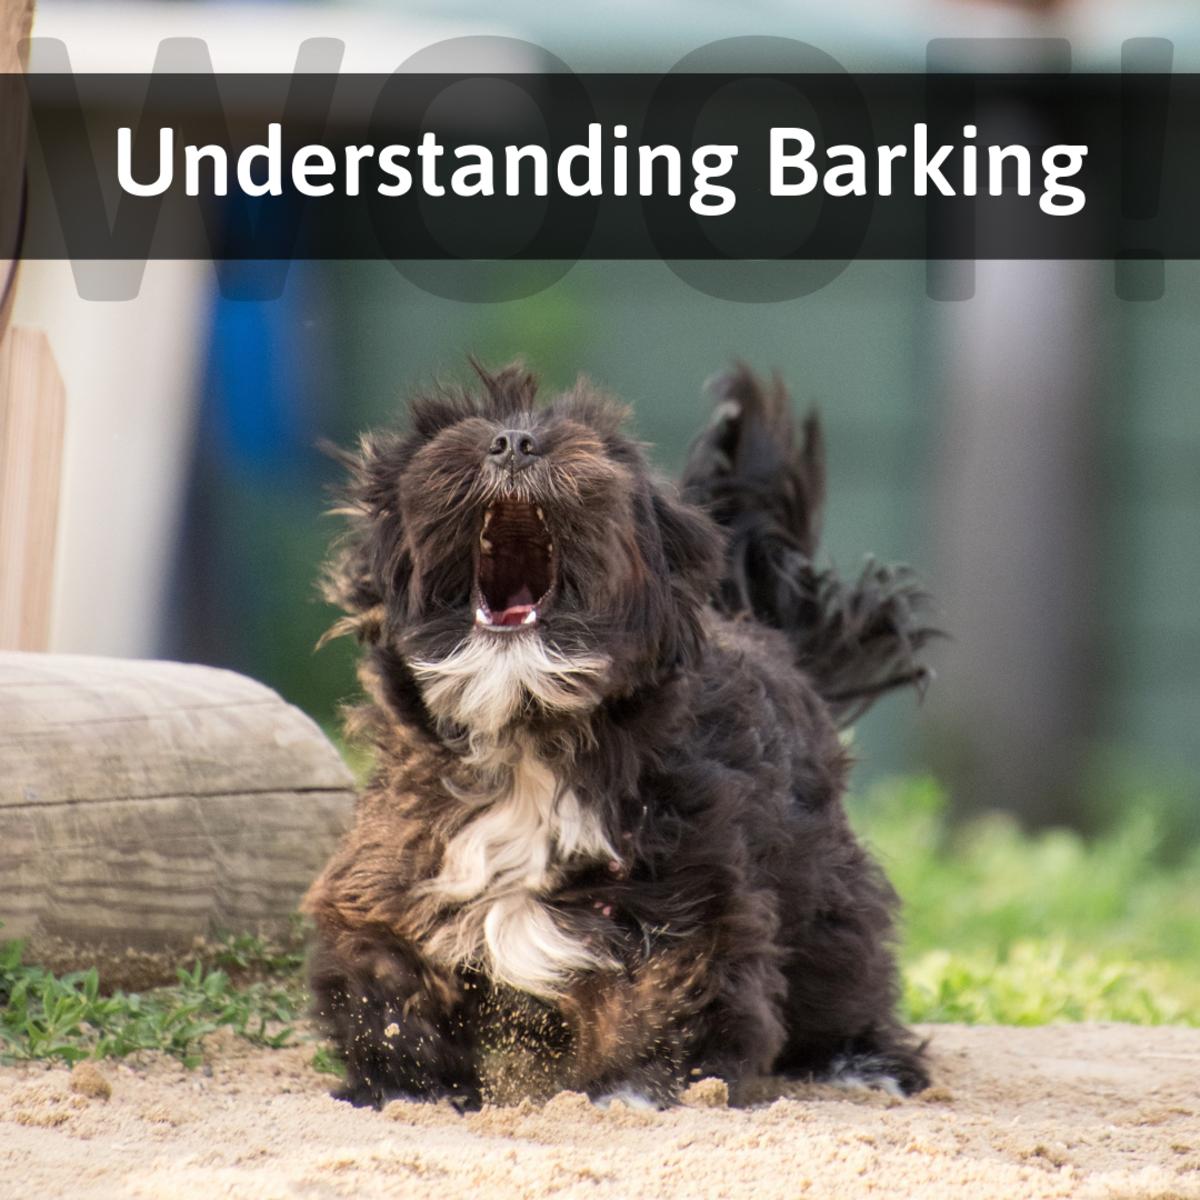 Why Do Dogs Bark? Understanding Barking Behavior and Body Language